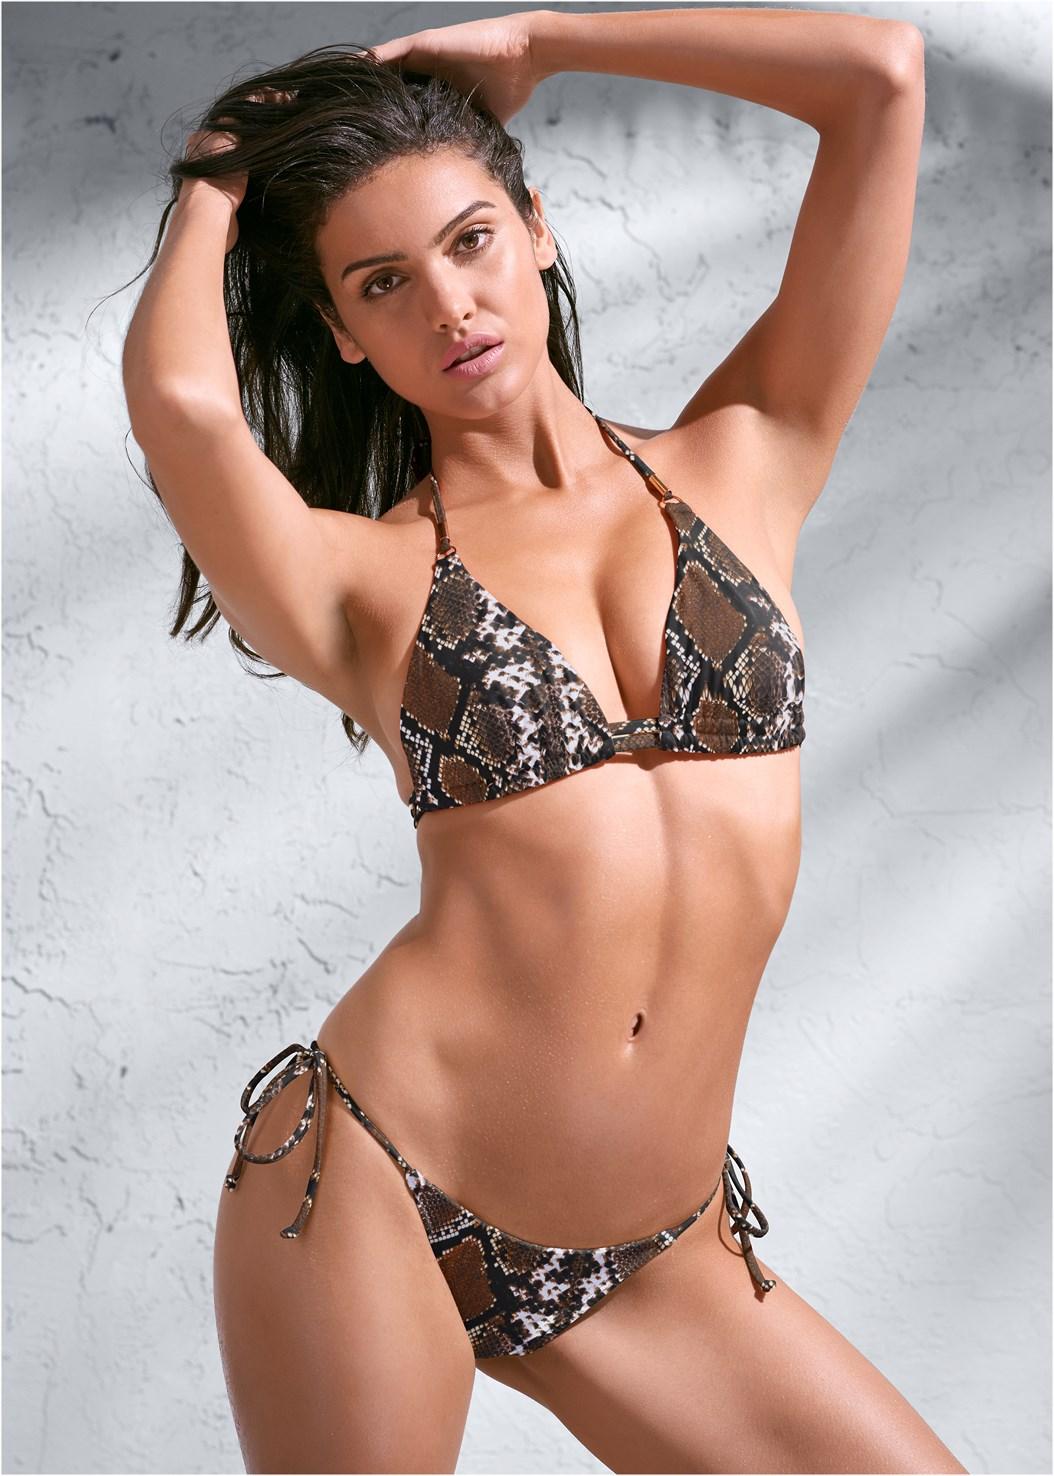 Sports Illustrated Swim™ Double Strap Triangle,Sports Illustrated Swim™ Tie Side String Bottom,Sports Illustrated Swim™ Sash Tie Side Bottom